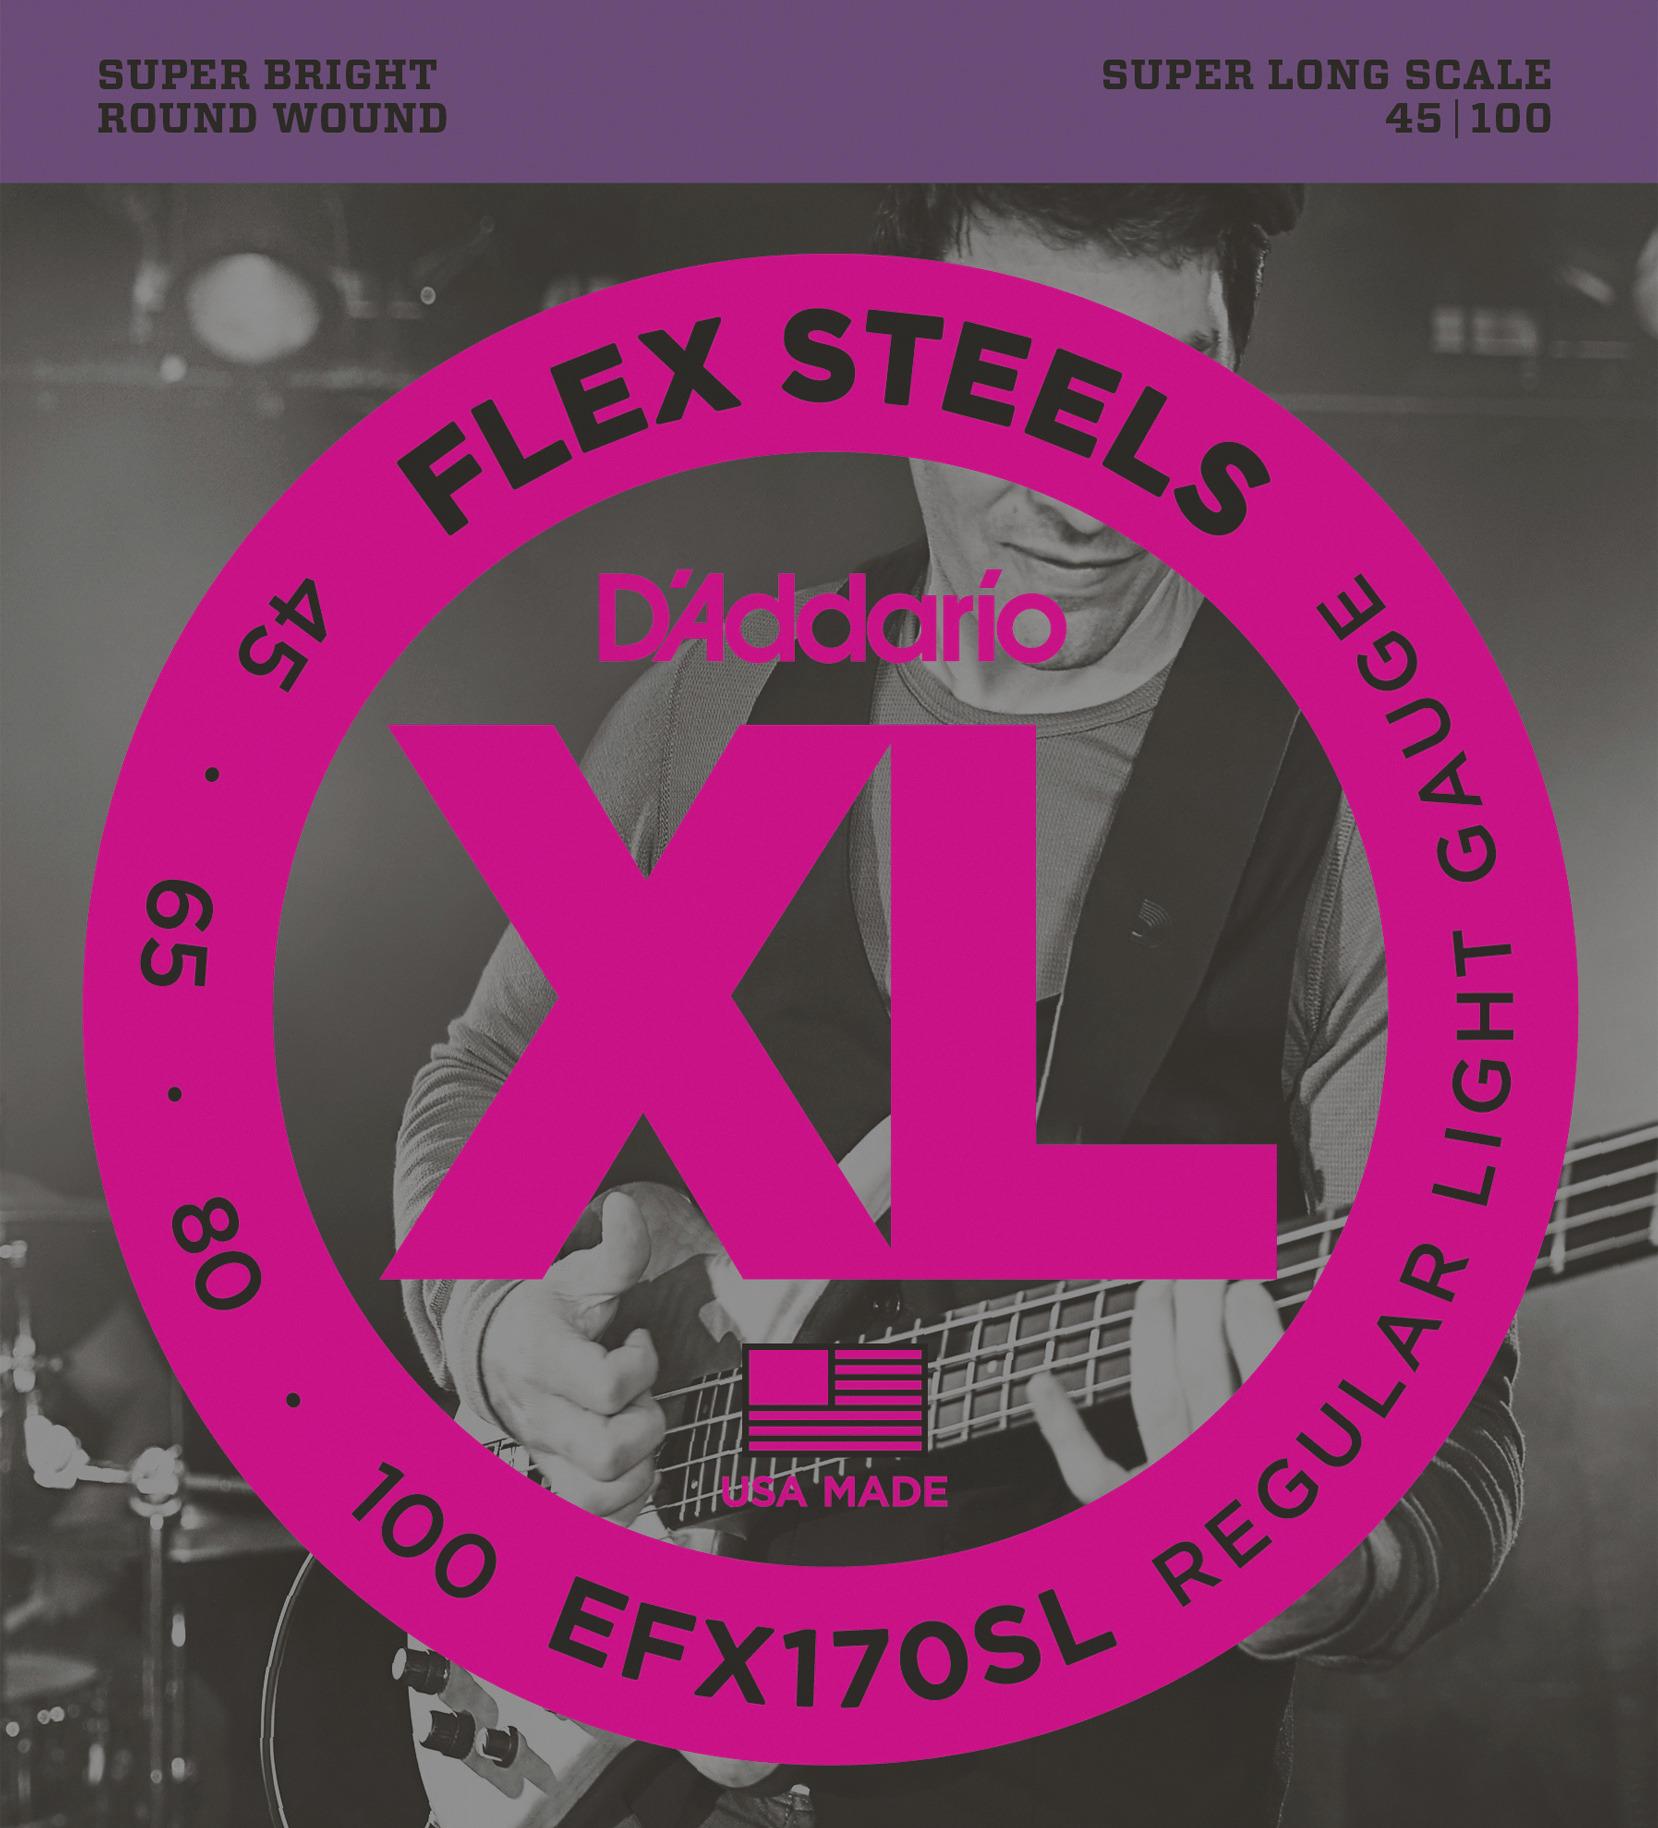 Daddario EFX170SL Saitensatz für E-Bass 045-100